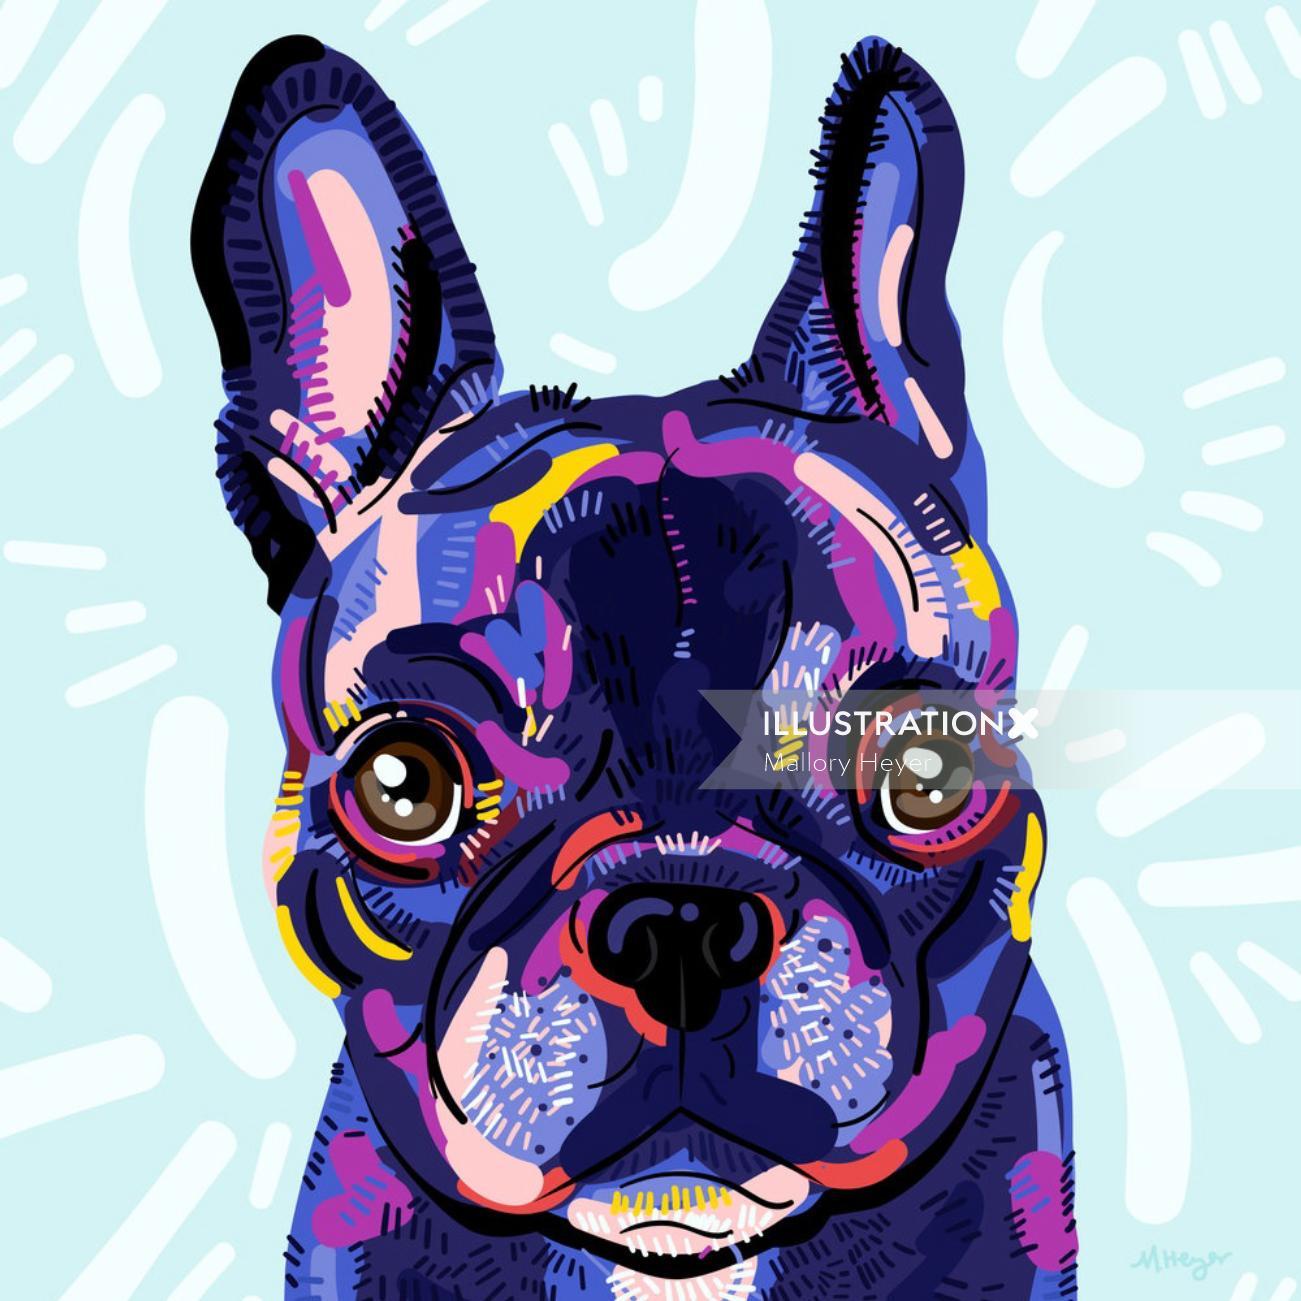 portrait illustration of Dog by Mallory Heyer